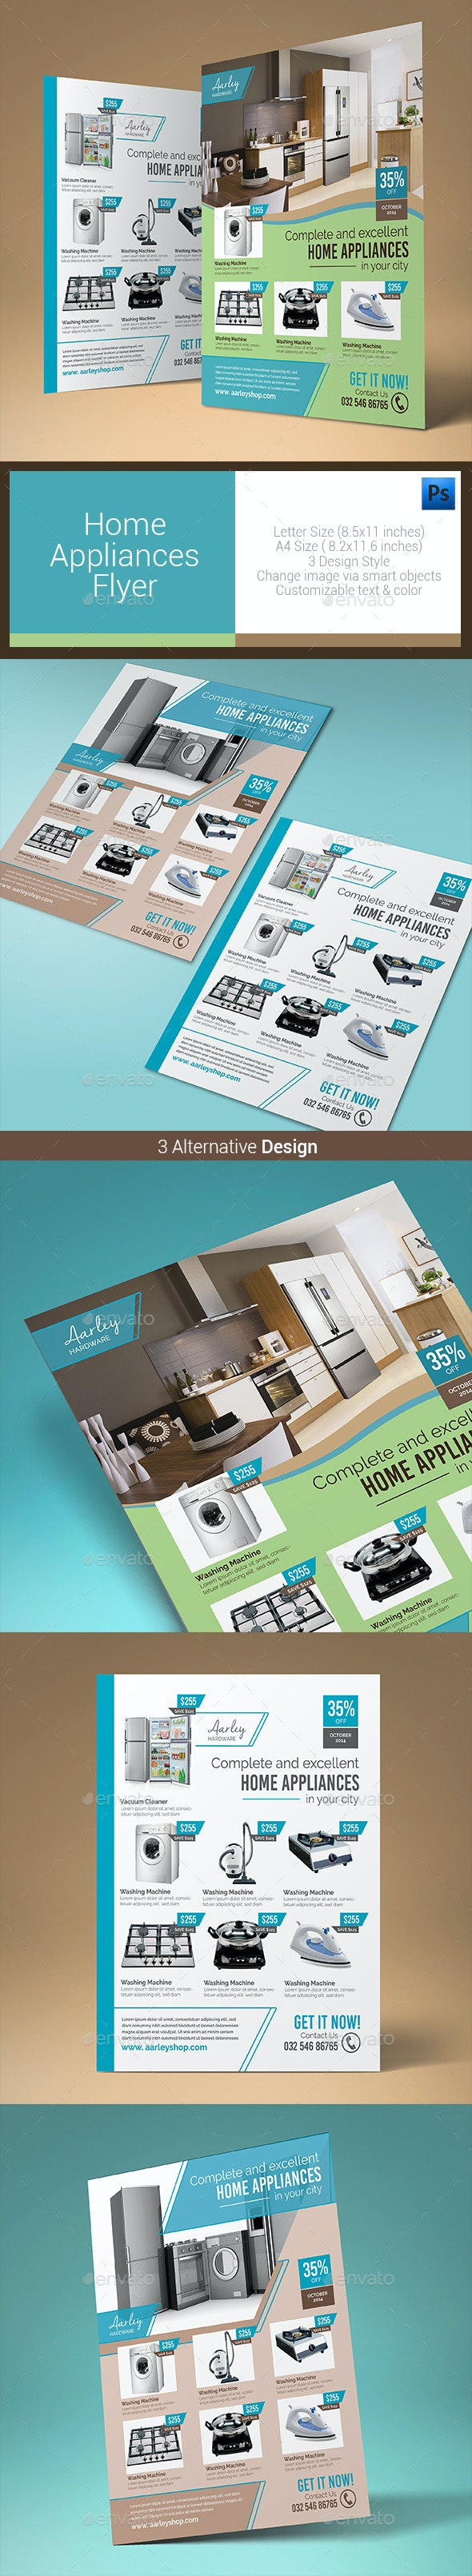 Home Appliances Flyer - Corporate Flyers